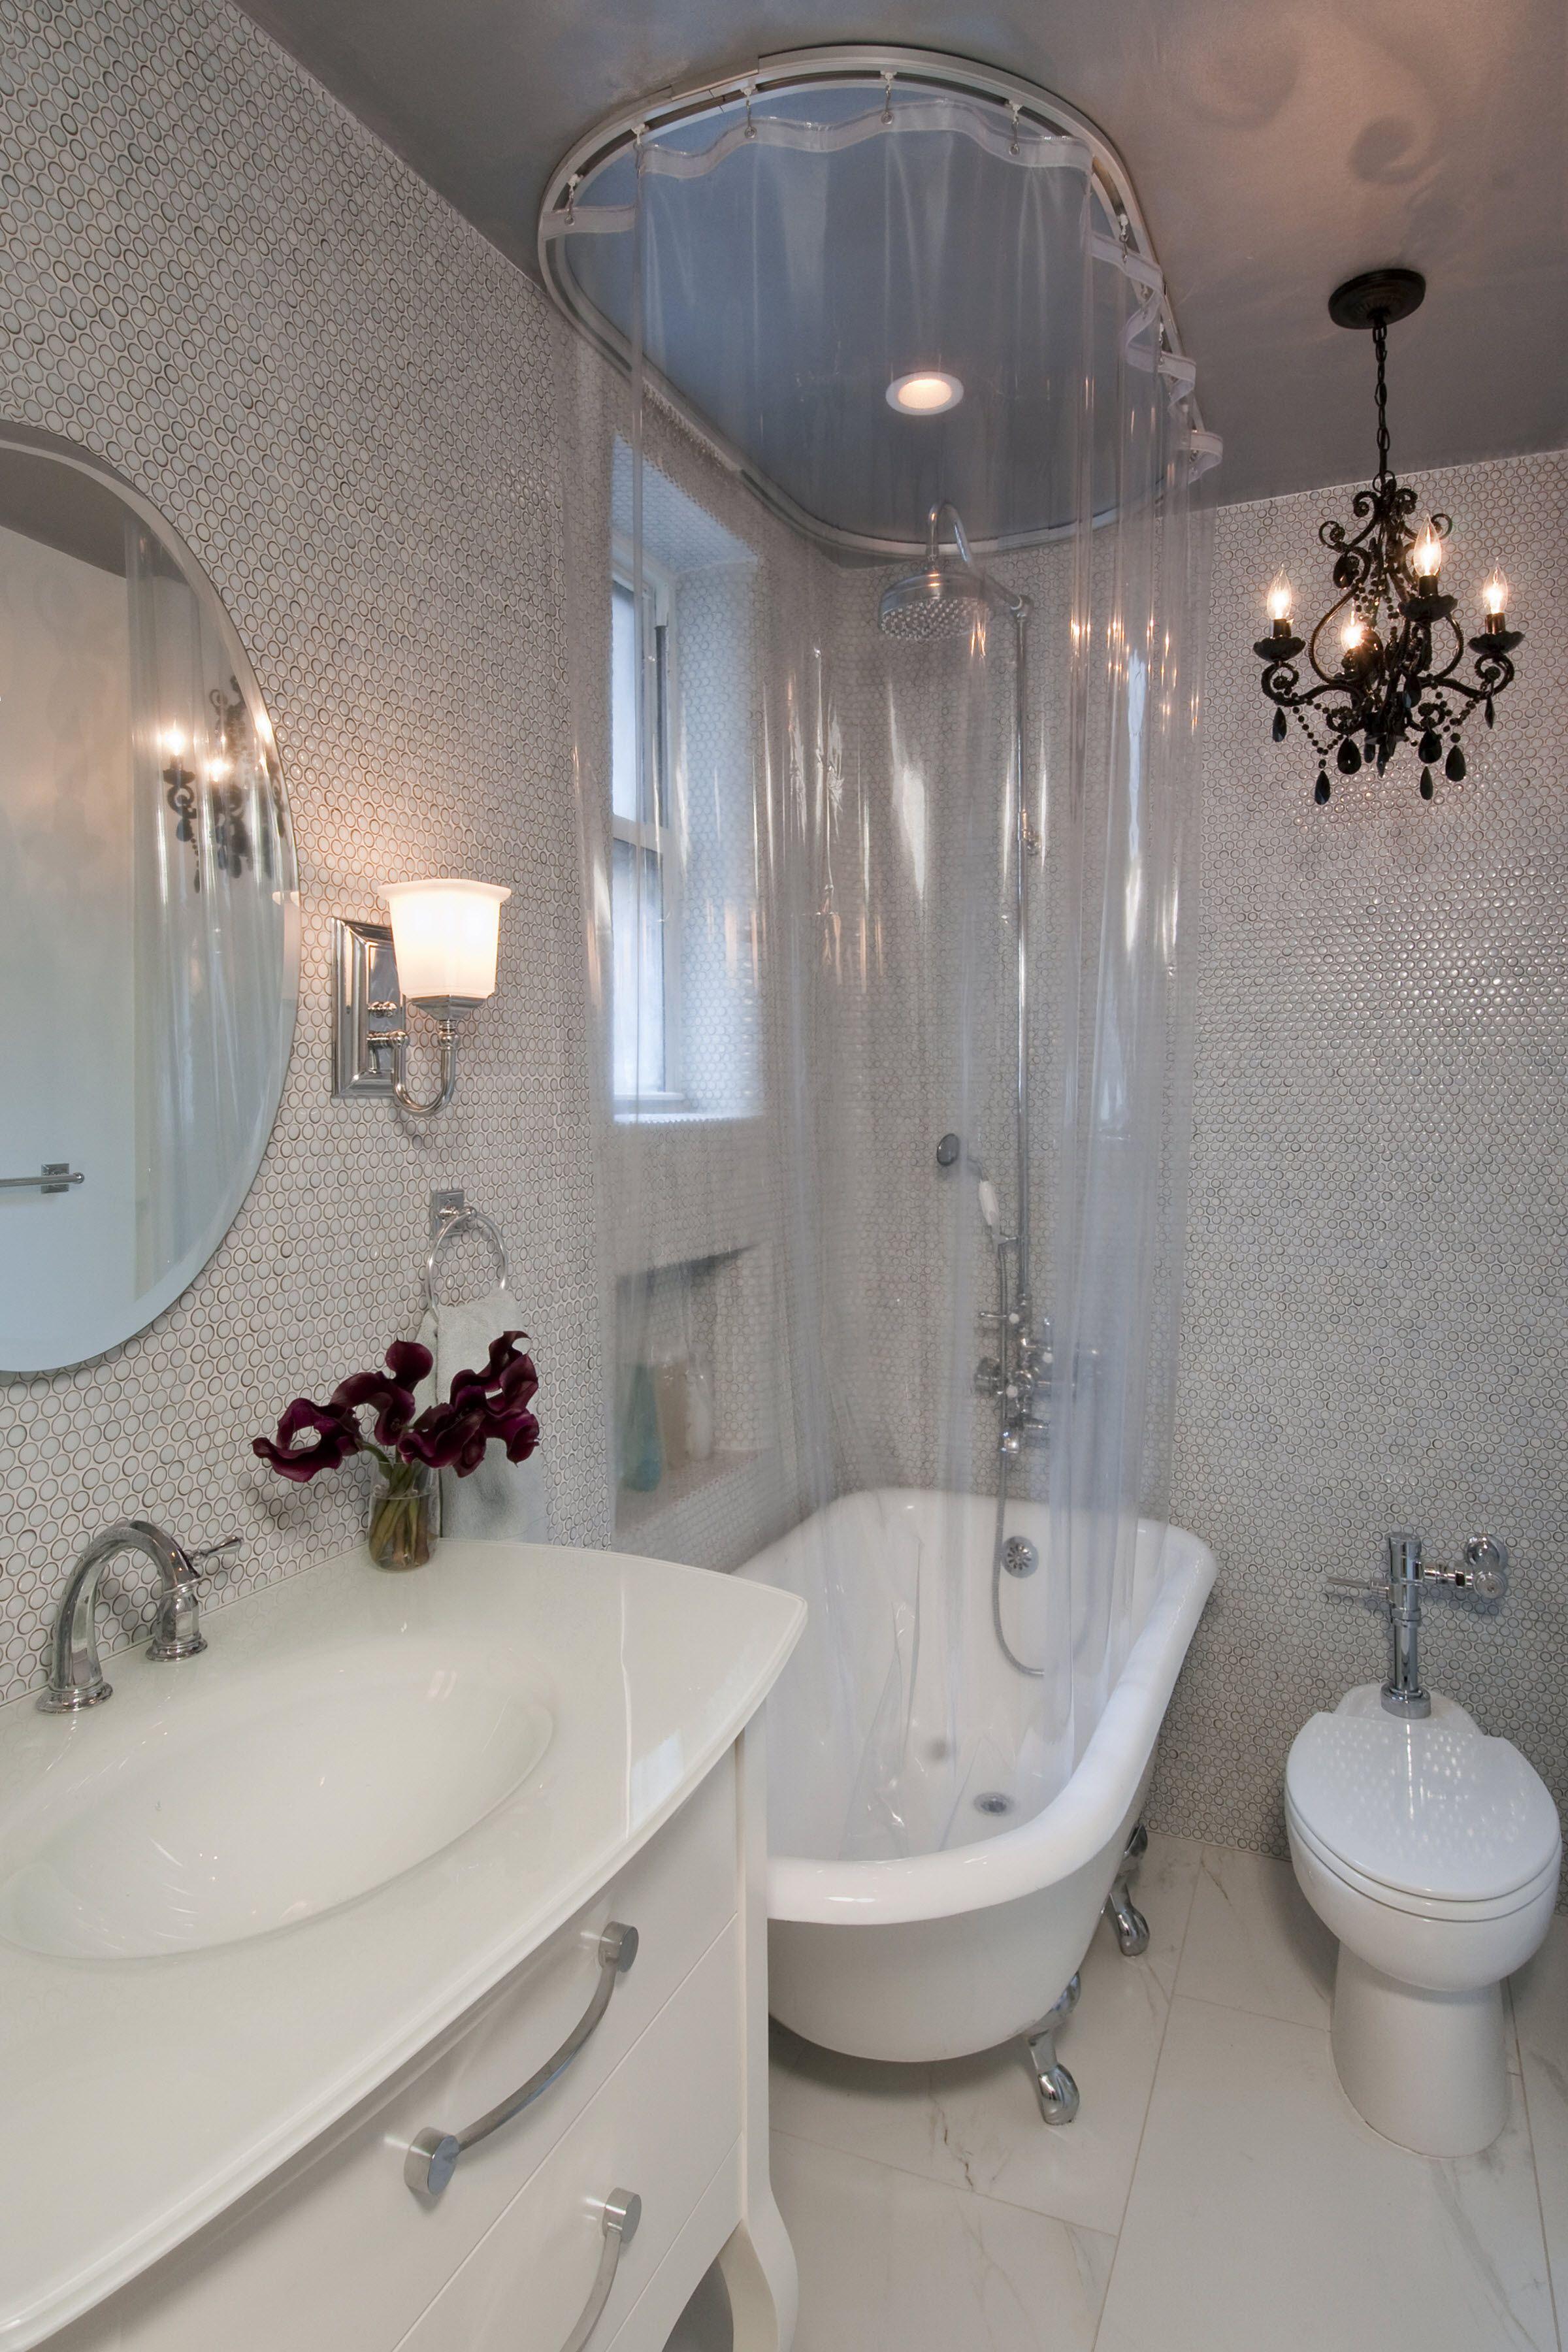 Feng Shui Bathroom Design Clawfoot Tub Shower Curtain Clawfoot